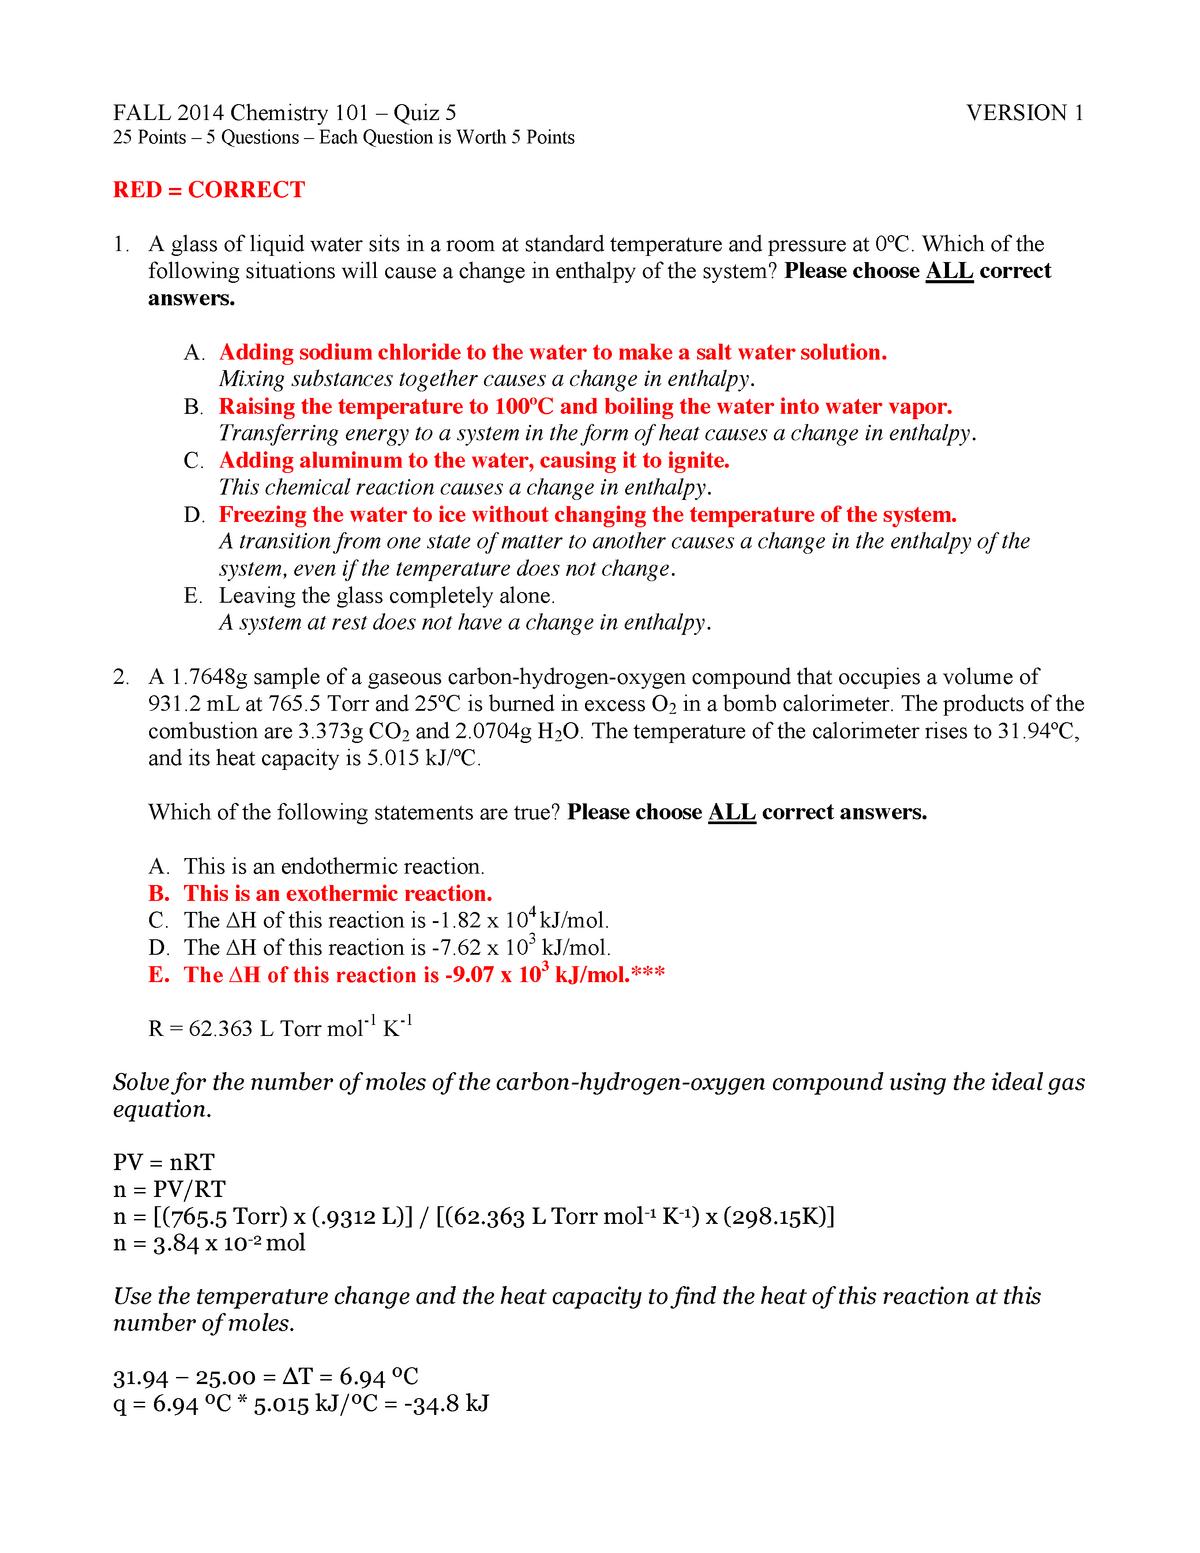 Quiz 5 Key - quiz 5 answers - CHEM 101: General Chemistry